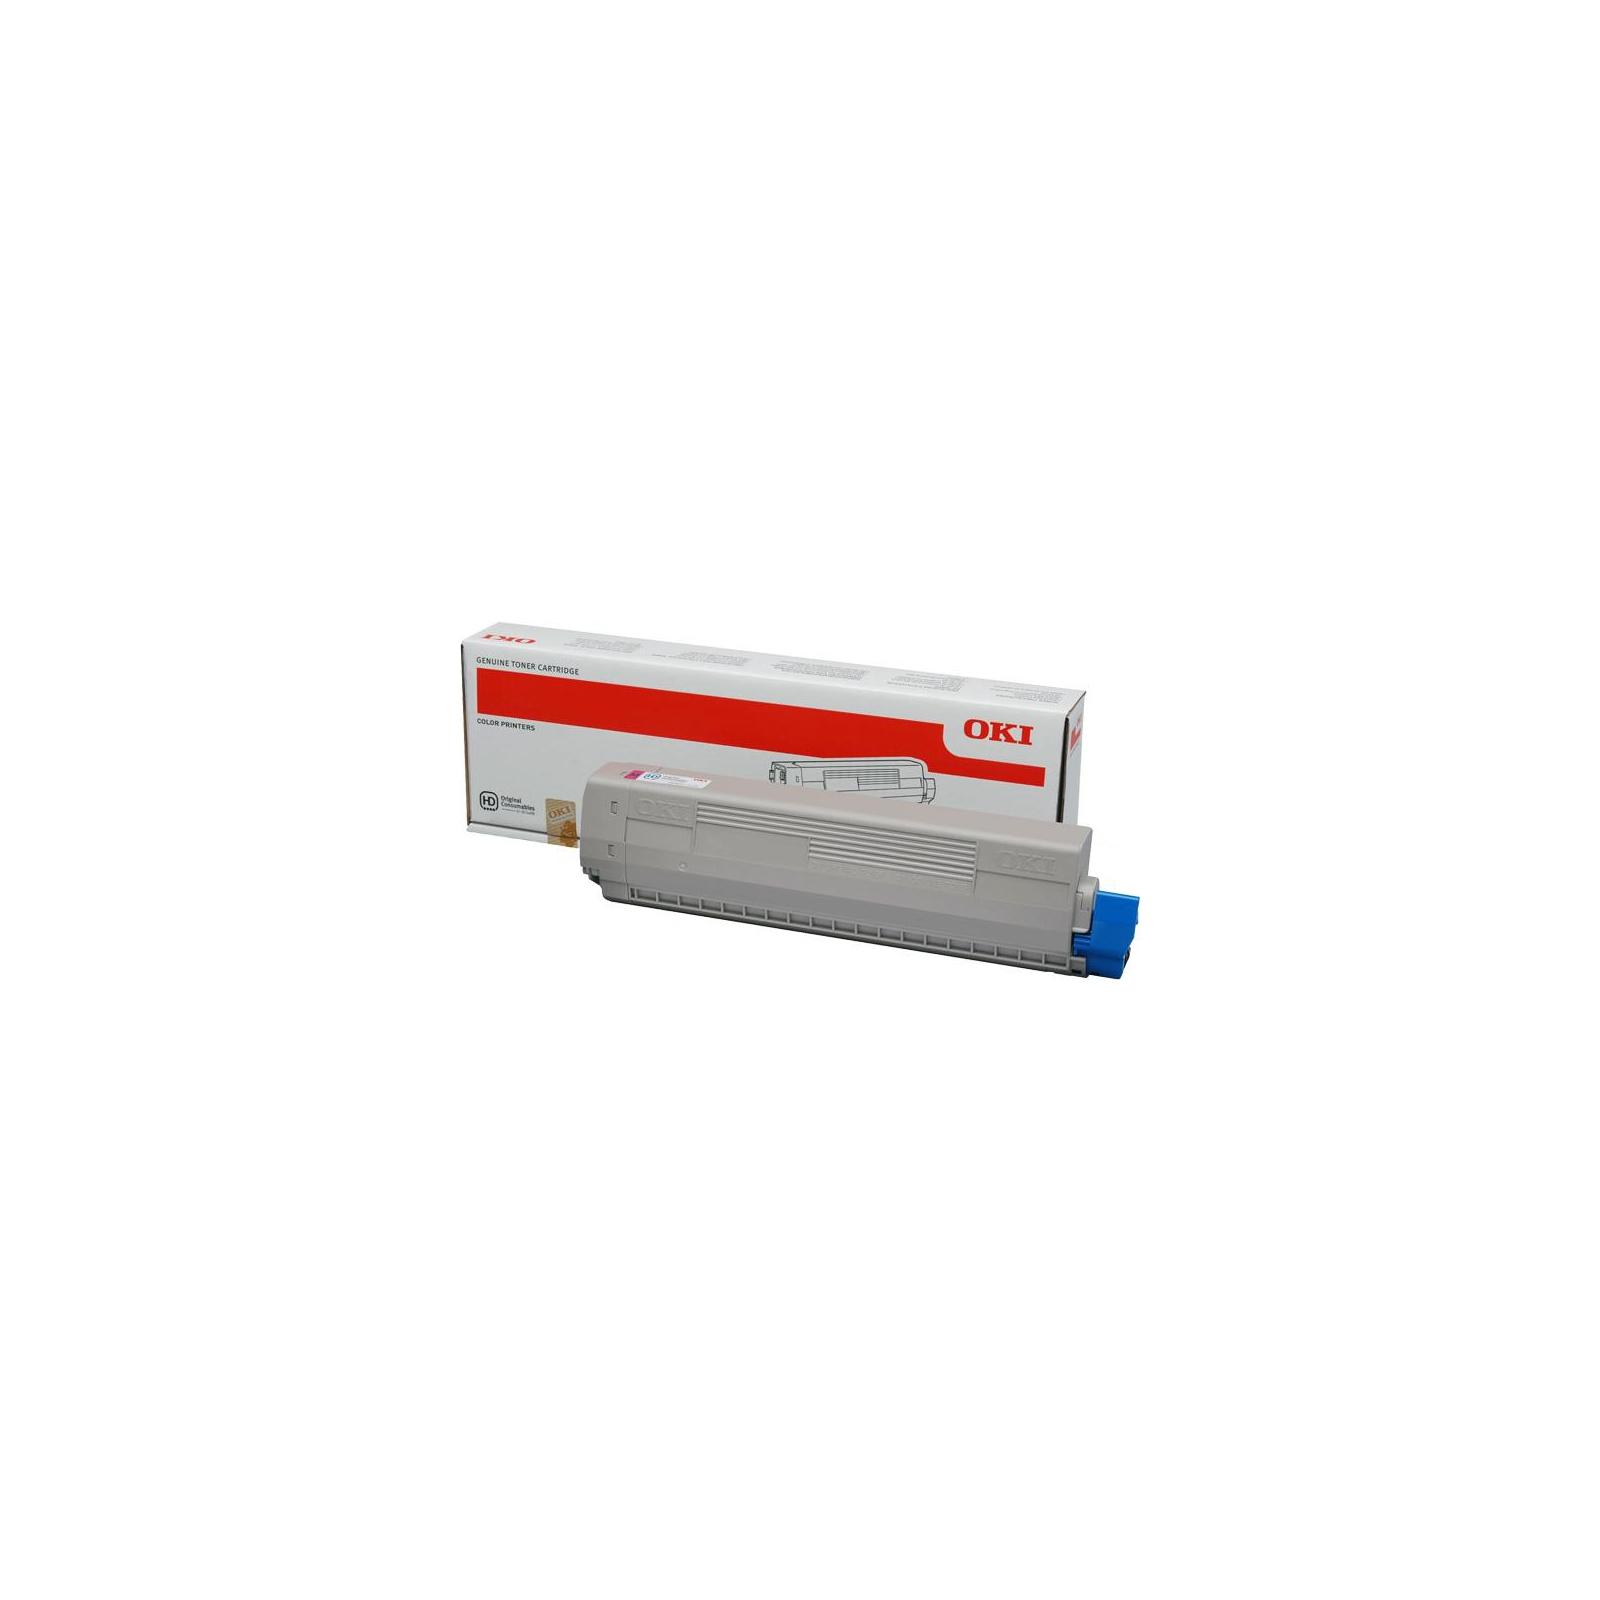 Тонер-картридж OKI C831/841 10K MAGENTA (44844506)